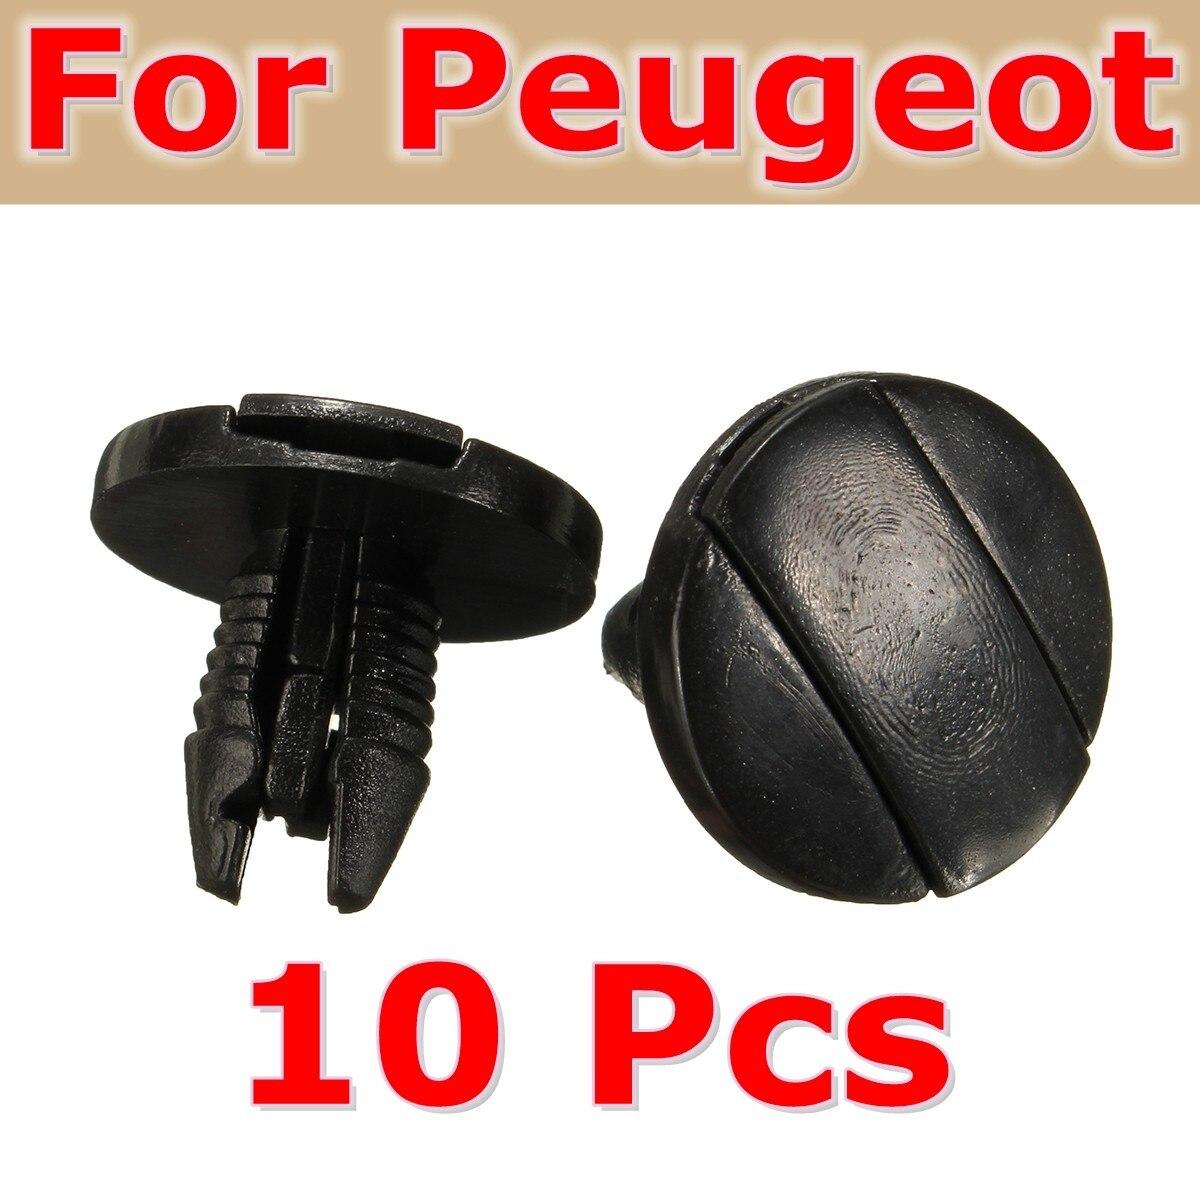 2x PEUGEOT 207 307 308 WHEEL ARCH SPLASH GUARD TRIM CLIPS INNER LINER